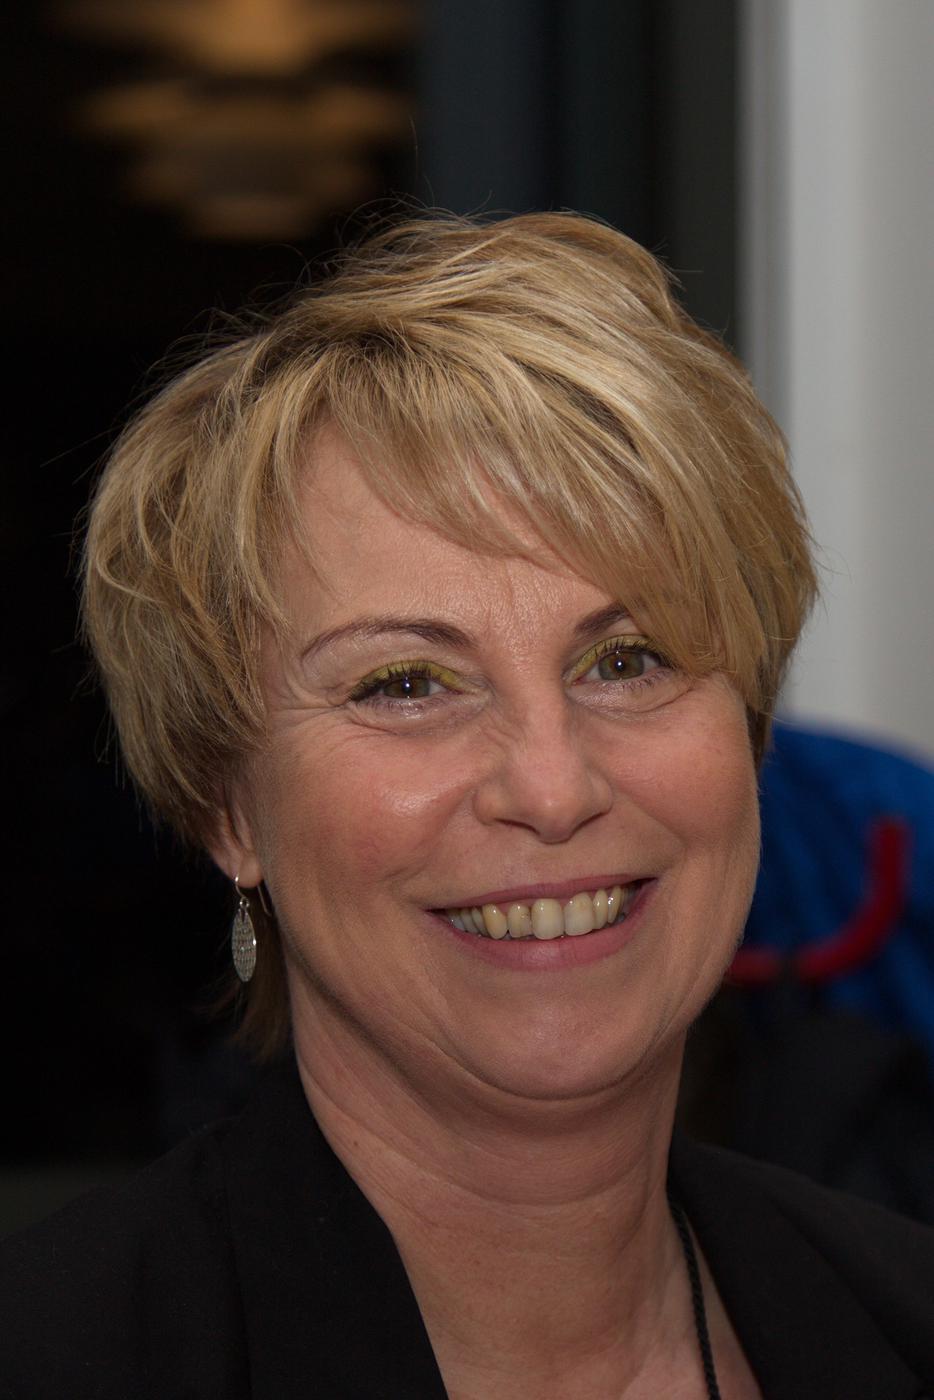 Susanne Nittel (SPD)